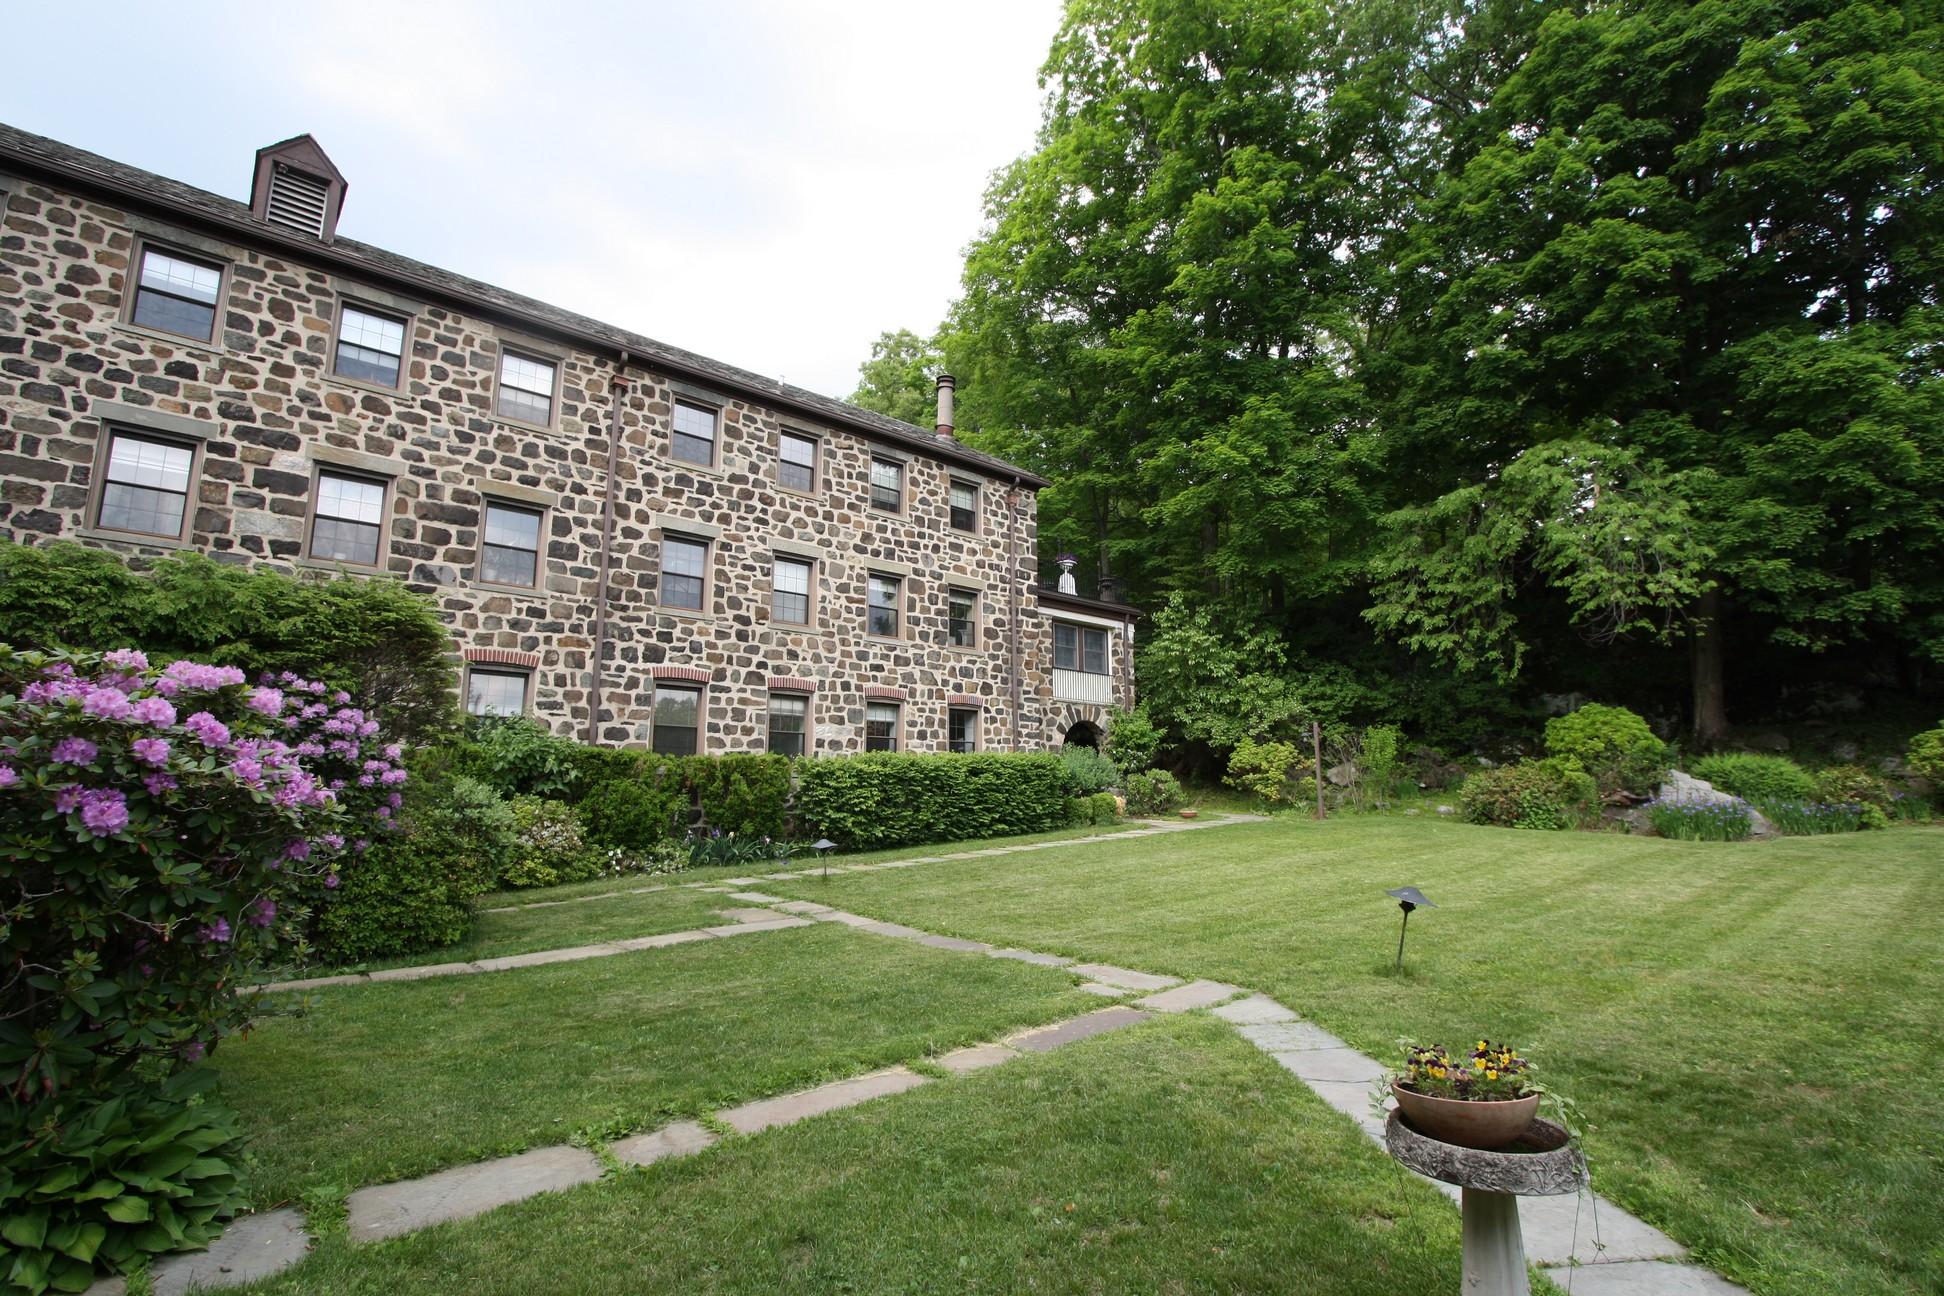 Condomínio para Venda às Grand Stone Structures and Gorgeous Gardens 341 Furnace Dock Road Unit 28 Cortlandt Manor, Nova York 10567 Estados Unidos